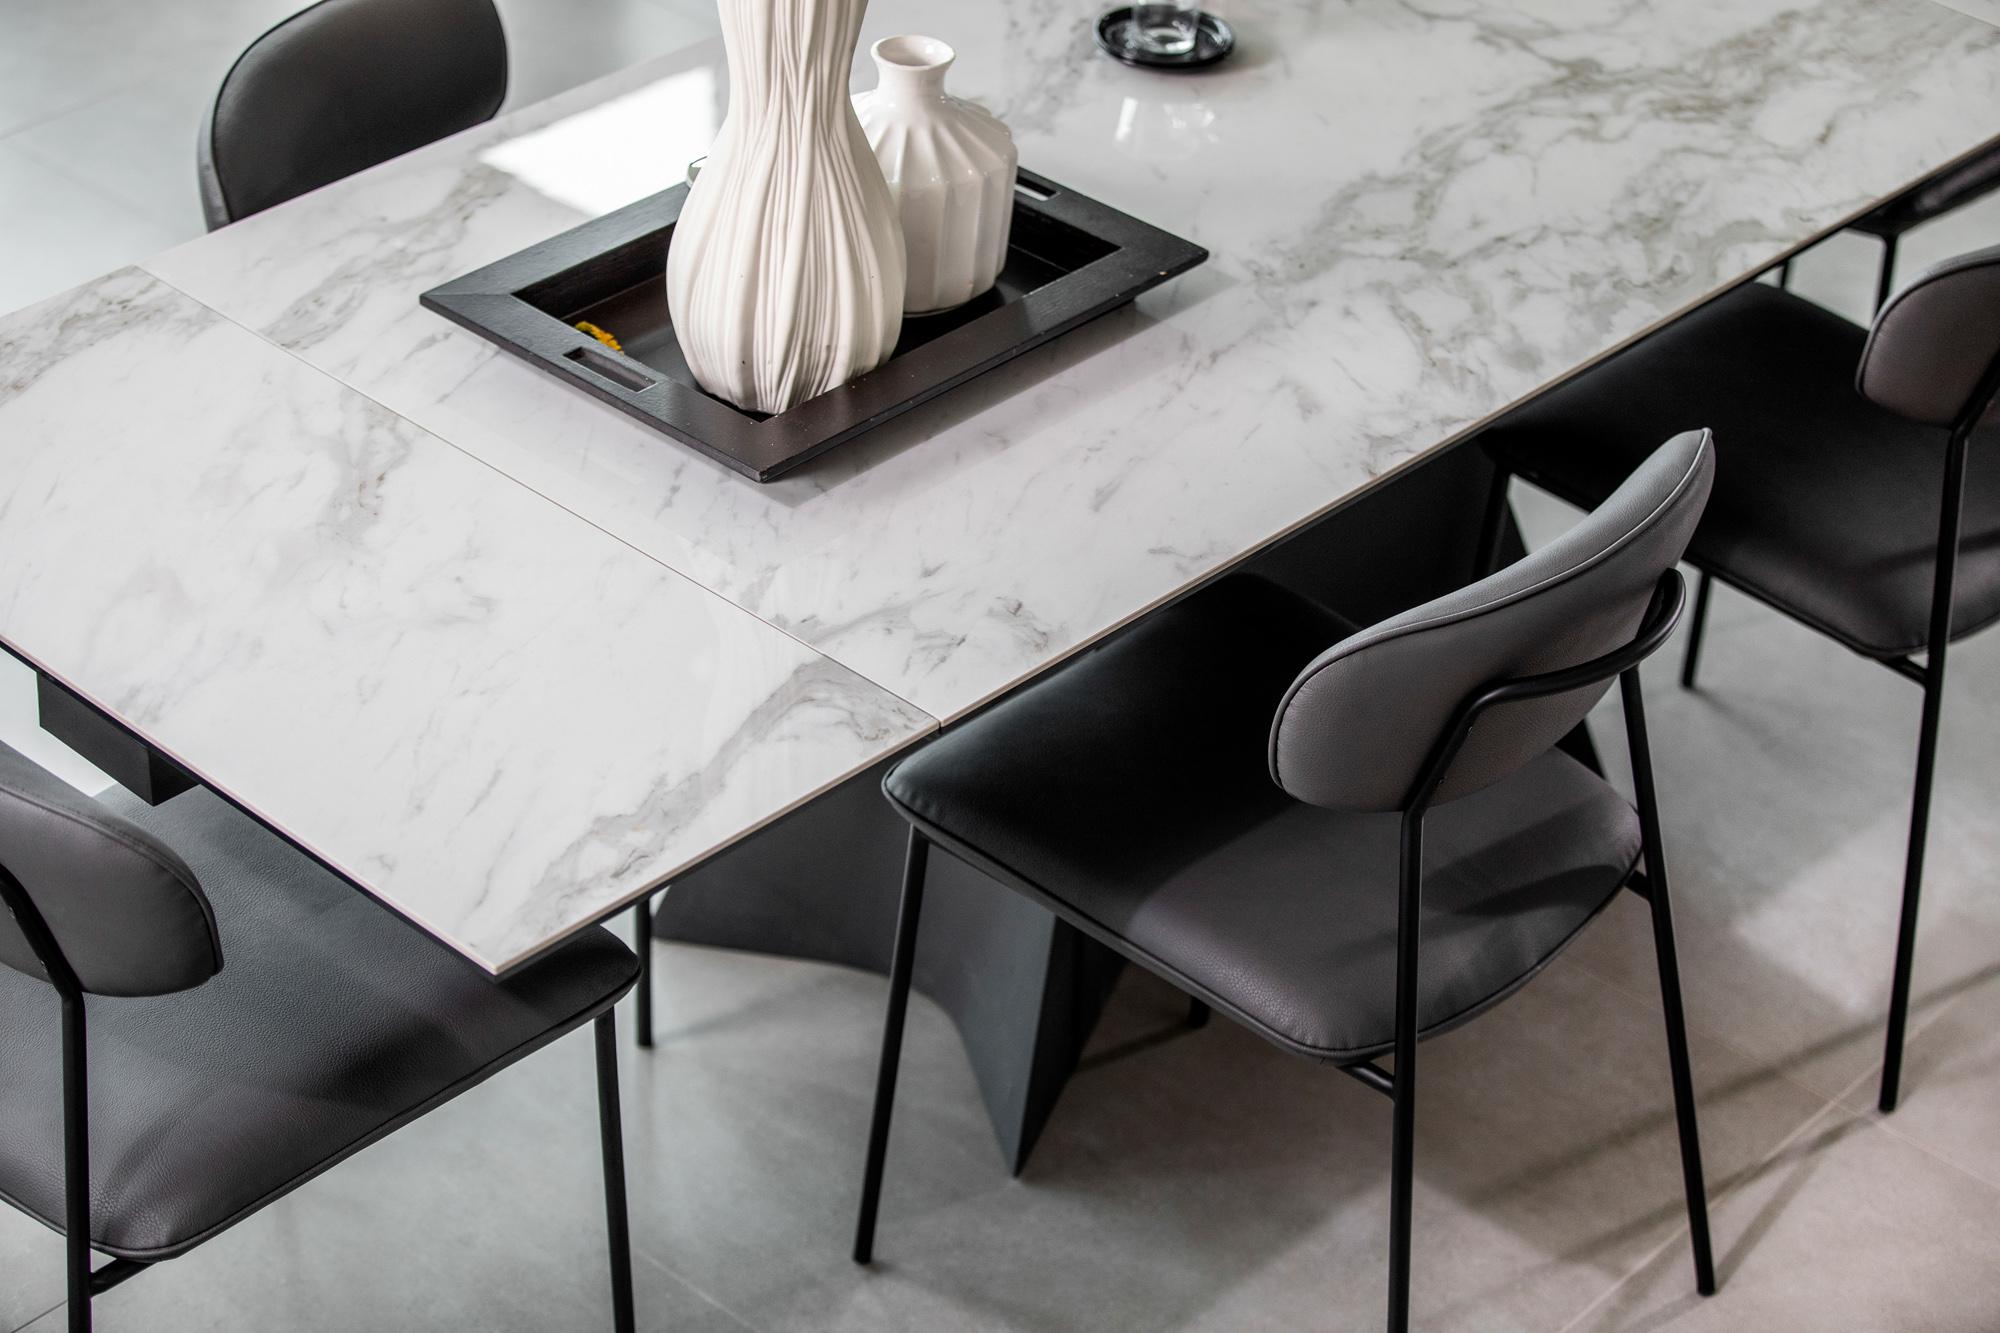 Table céramique extensible 7-7 cm VERONE